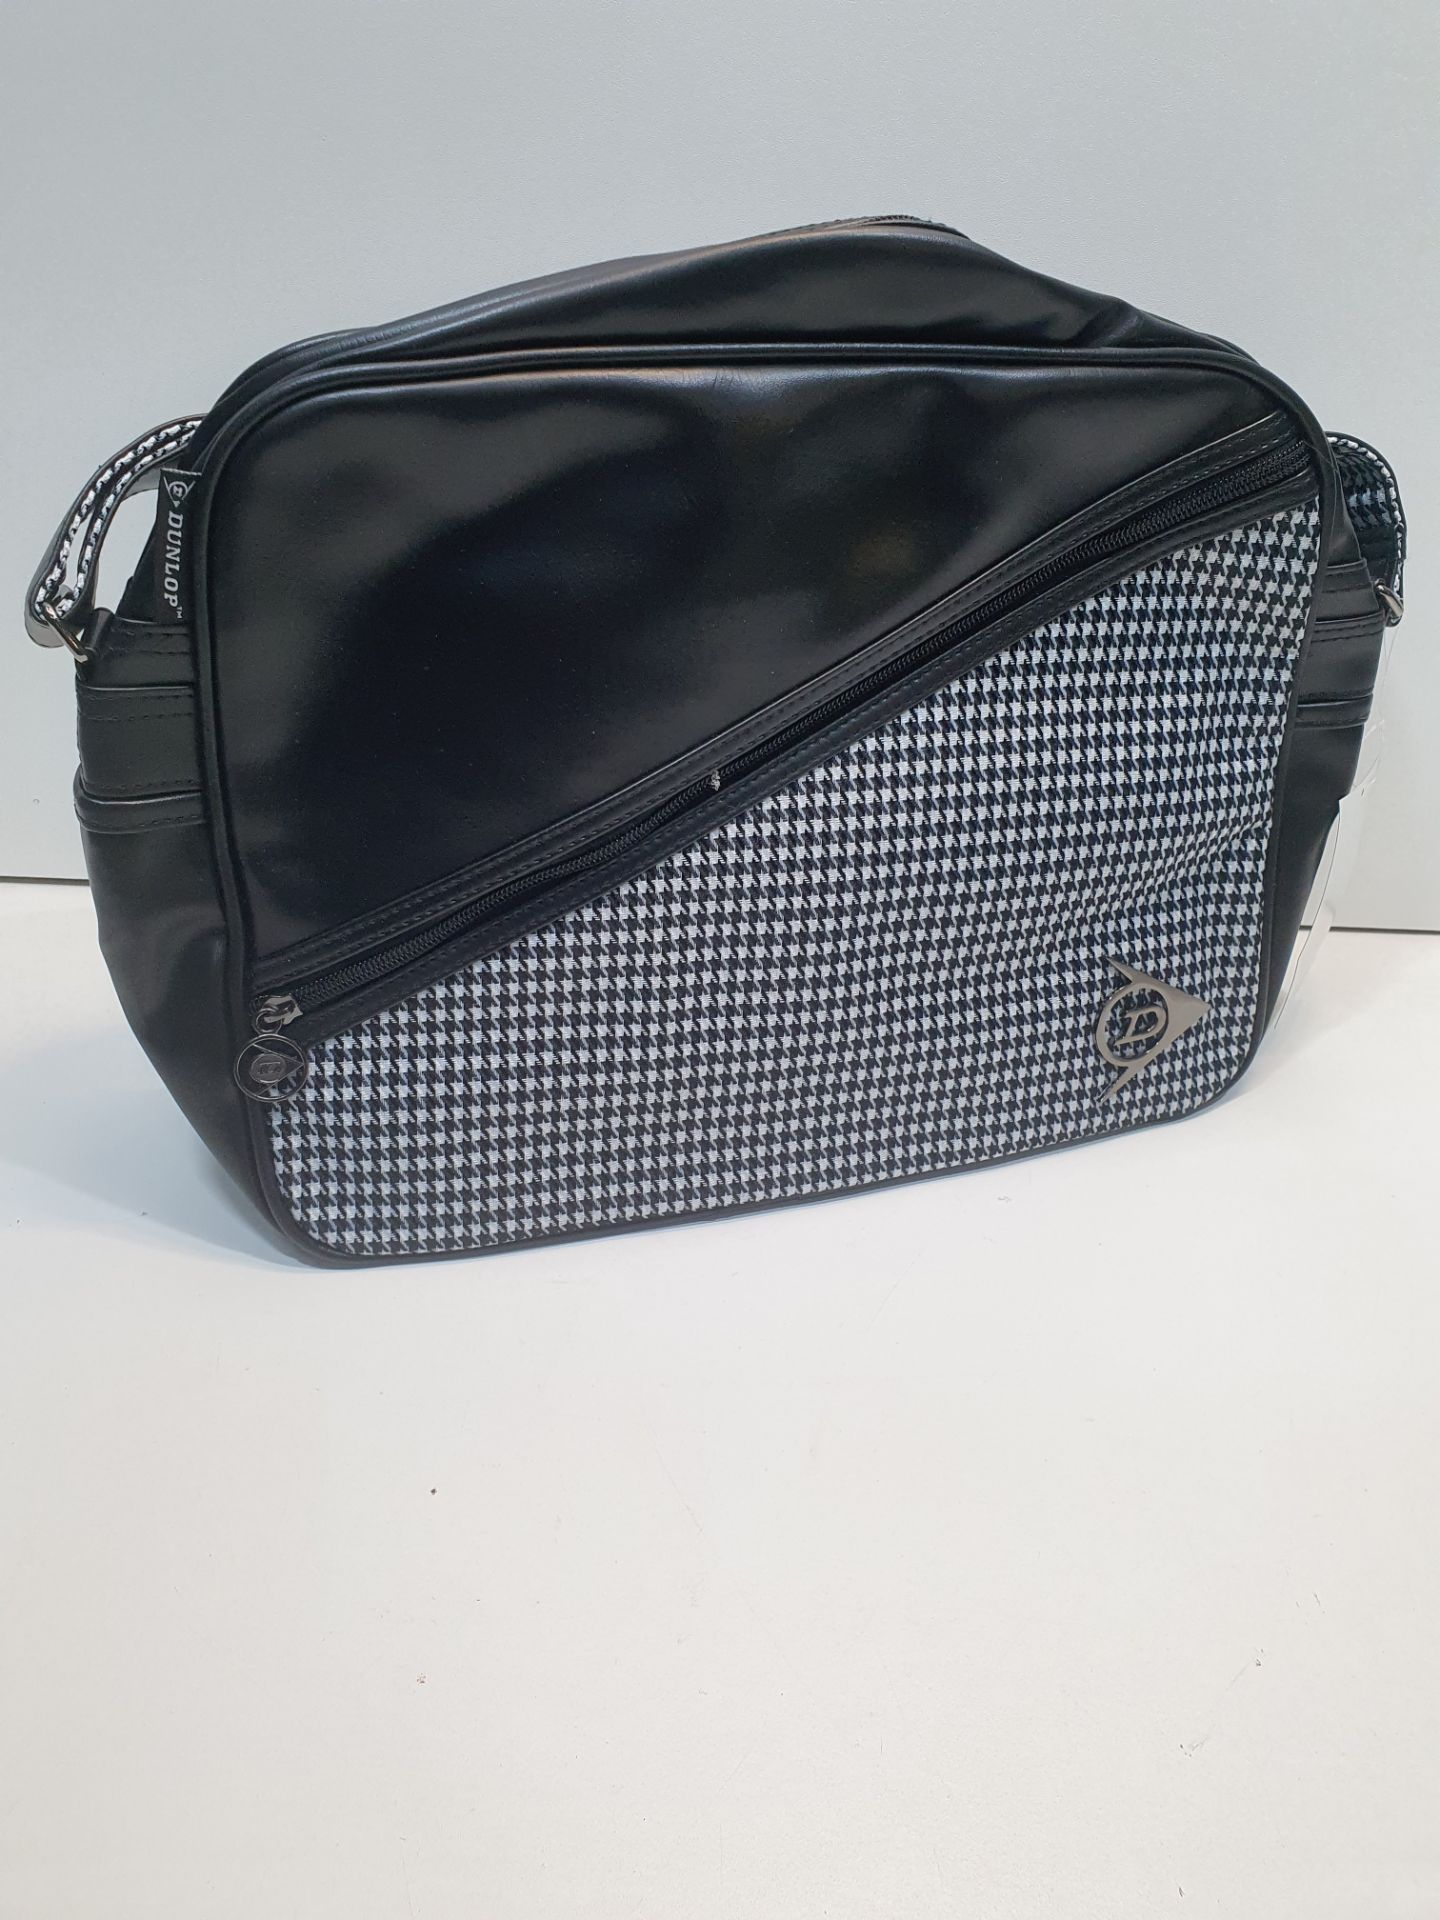 Dunlop PVC Flight Bag - Image 3 of 3